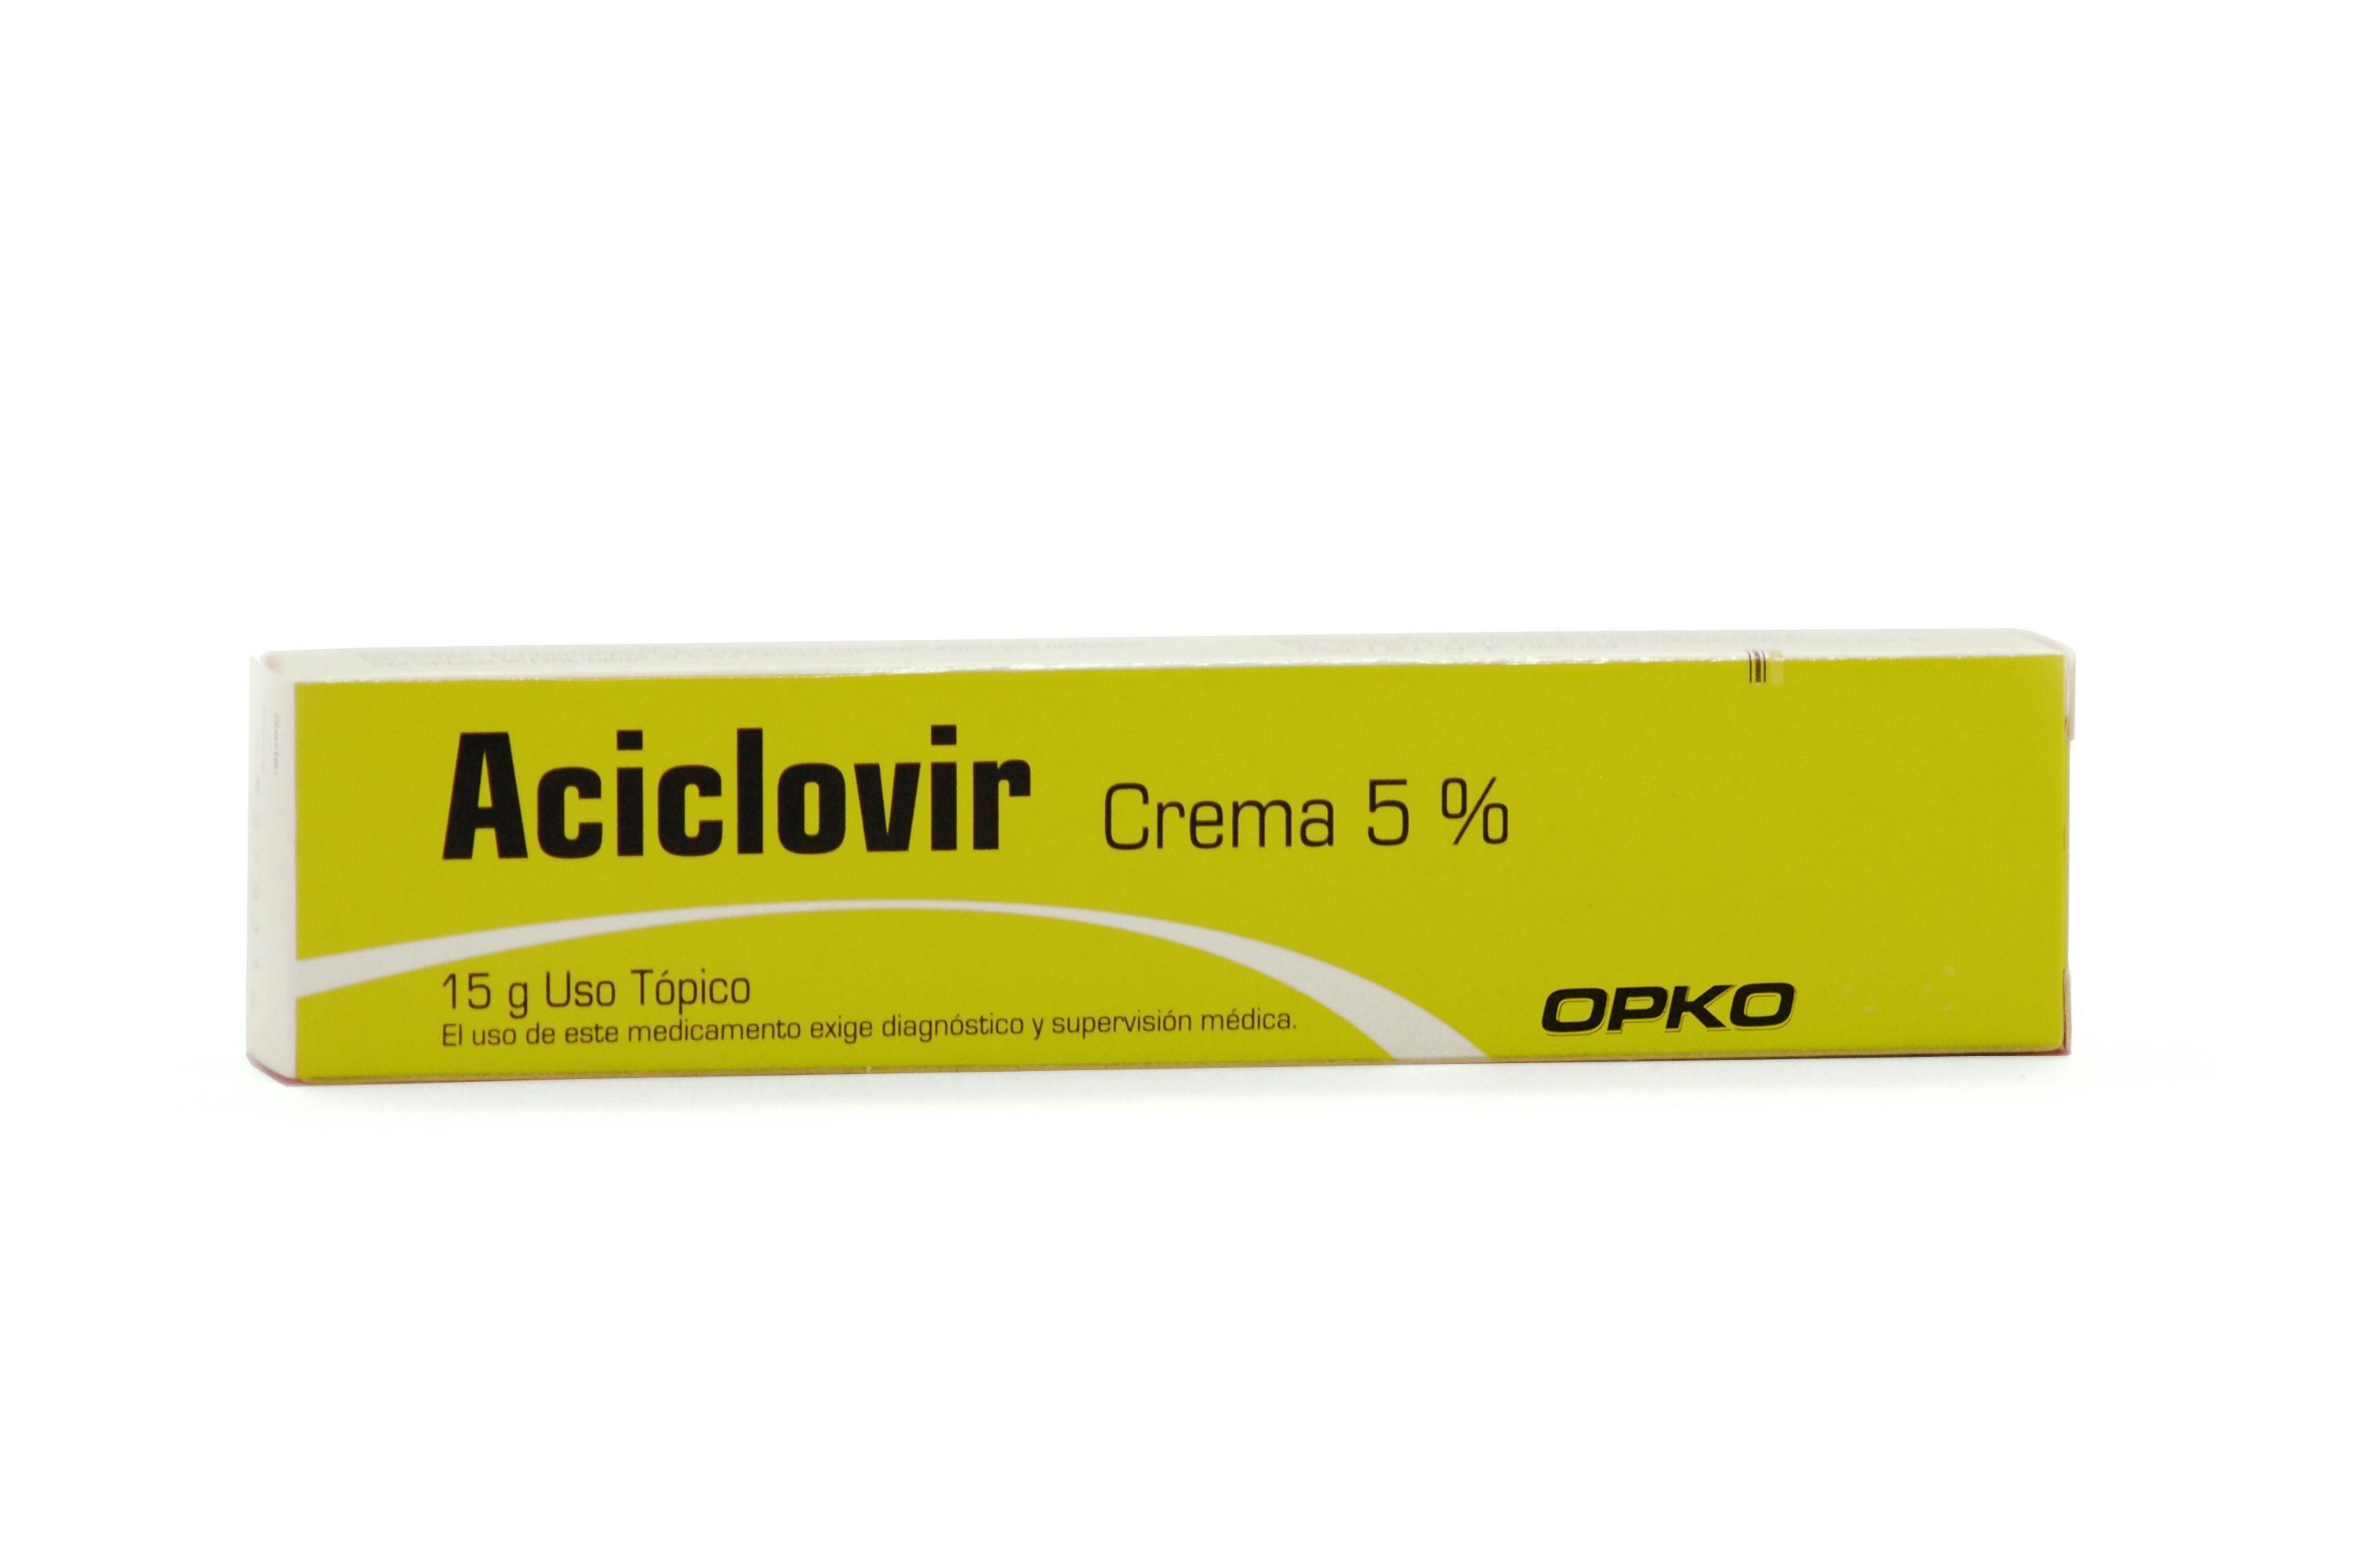 Aciclovir (Tópico)